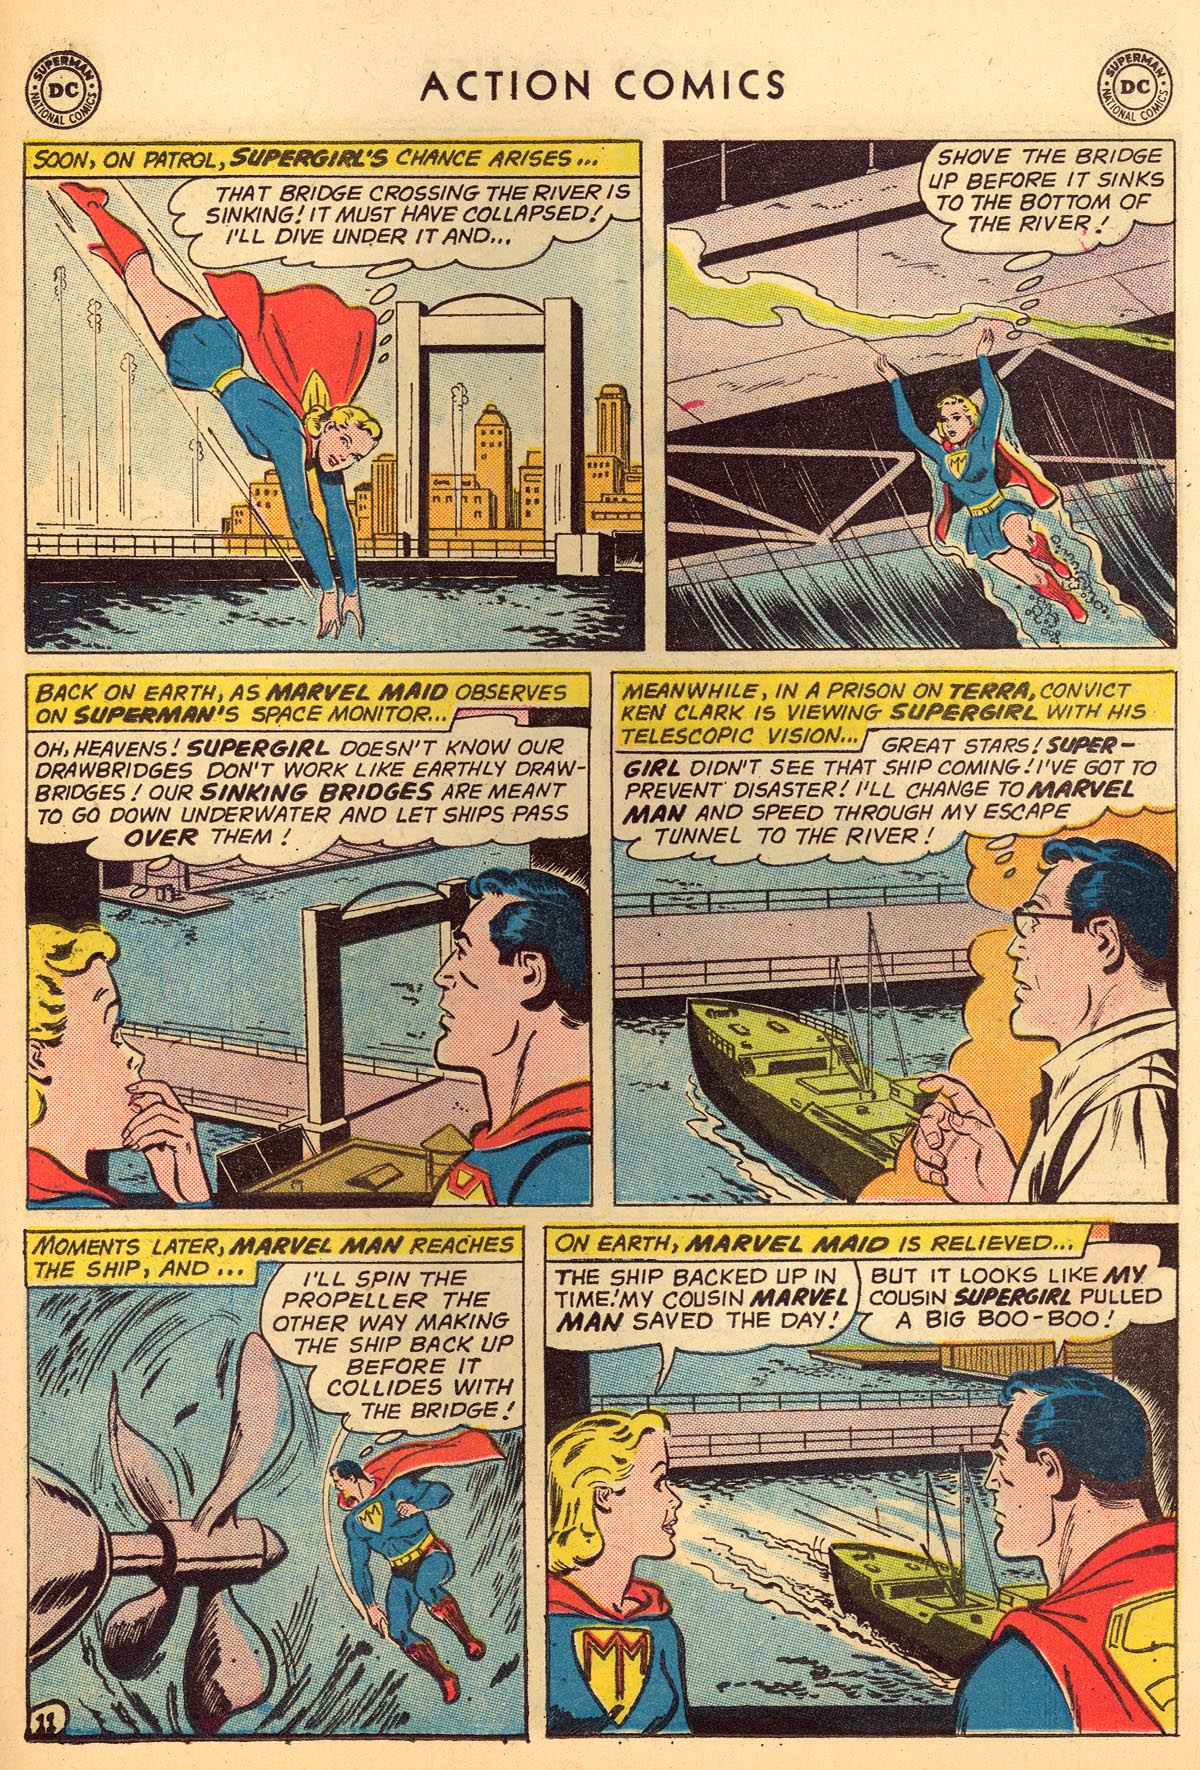 Action Comics (1938) 273 Page 26